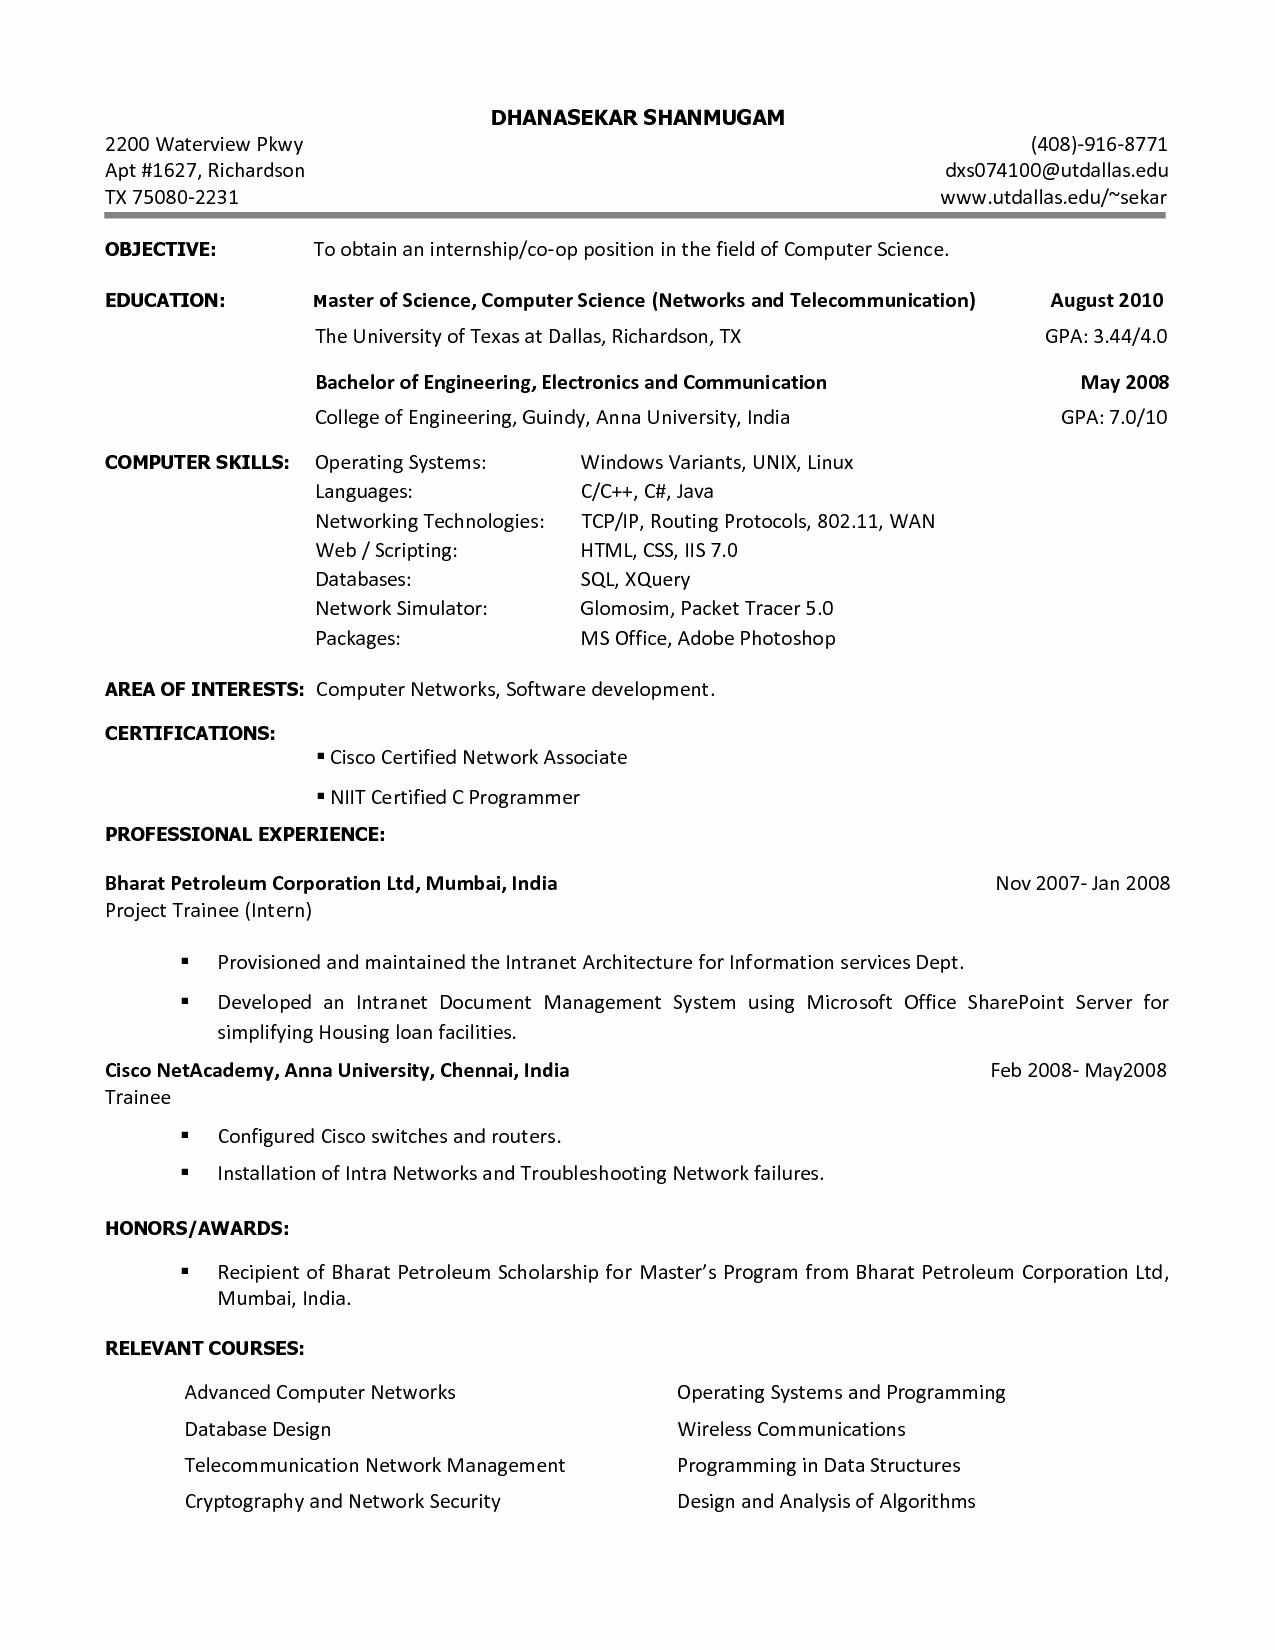 Computer Science Internship Resume Best Of Resume for Internship Puter Science Resume Ideas